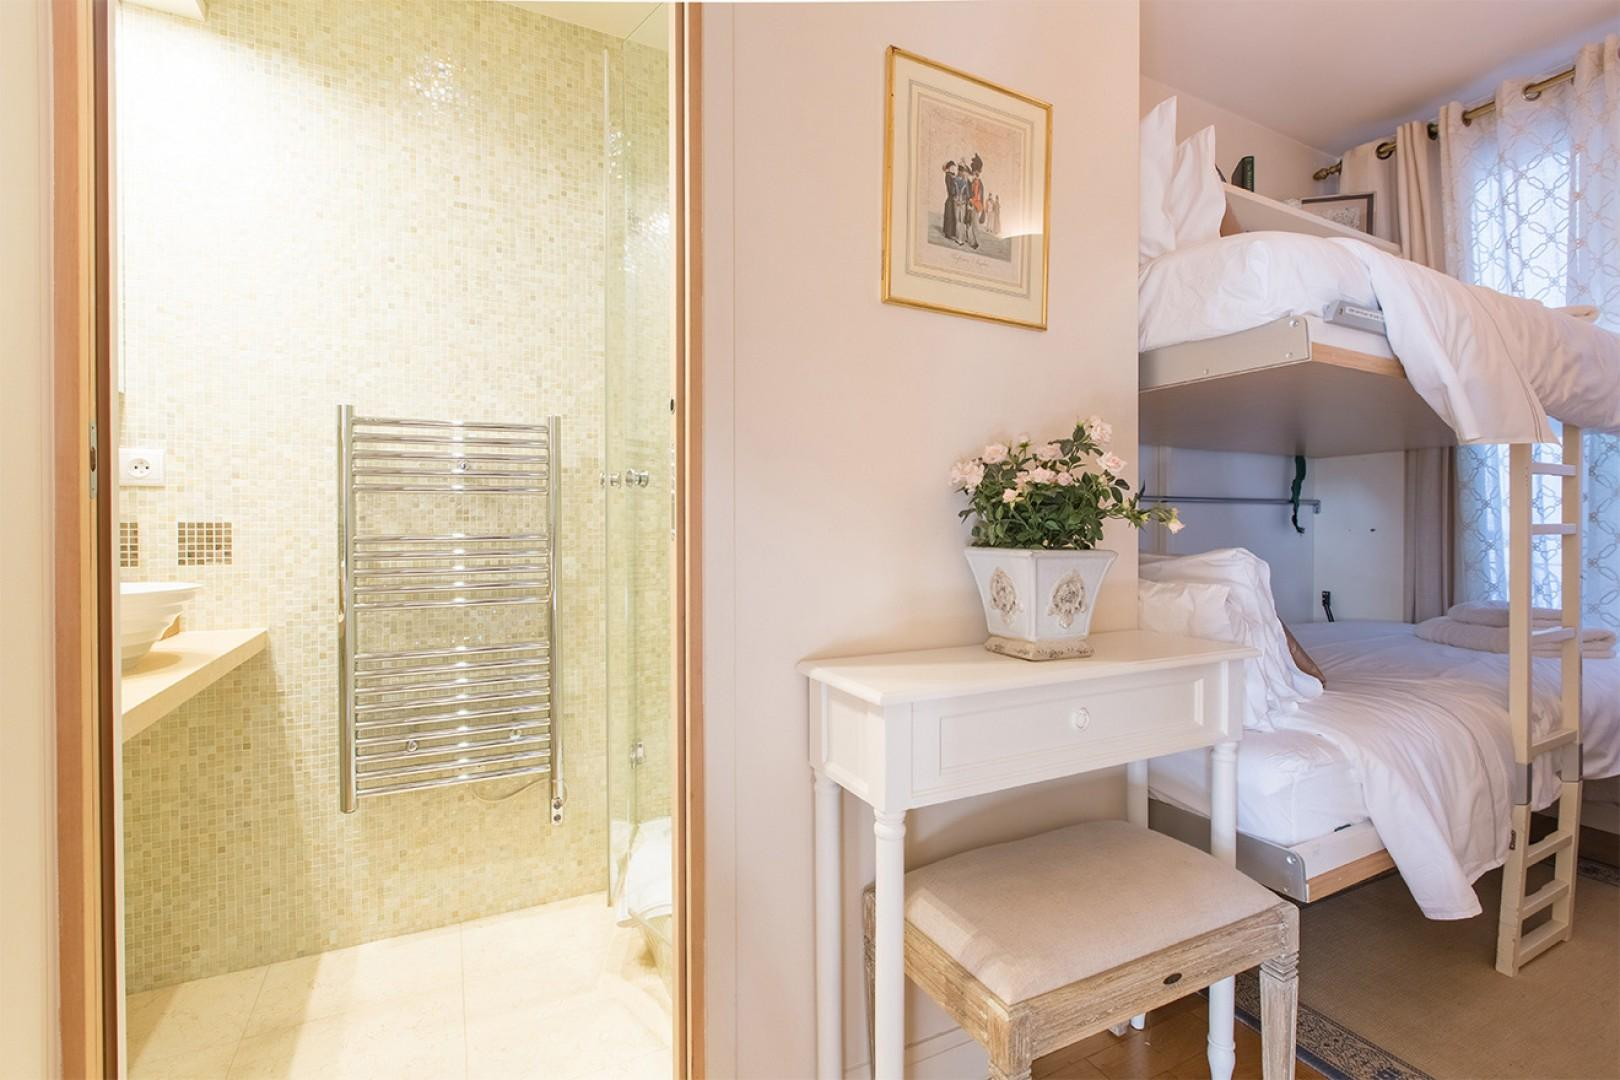 Bedroom 2 and adjacent bathroom 2